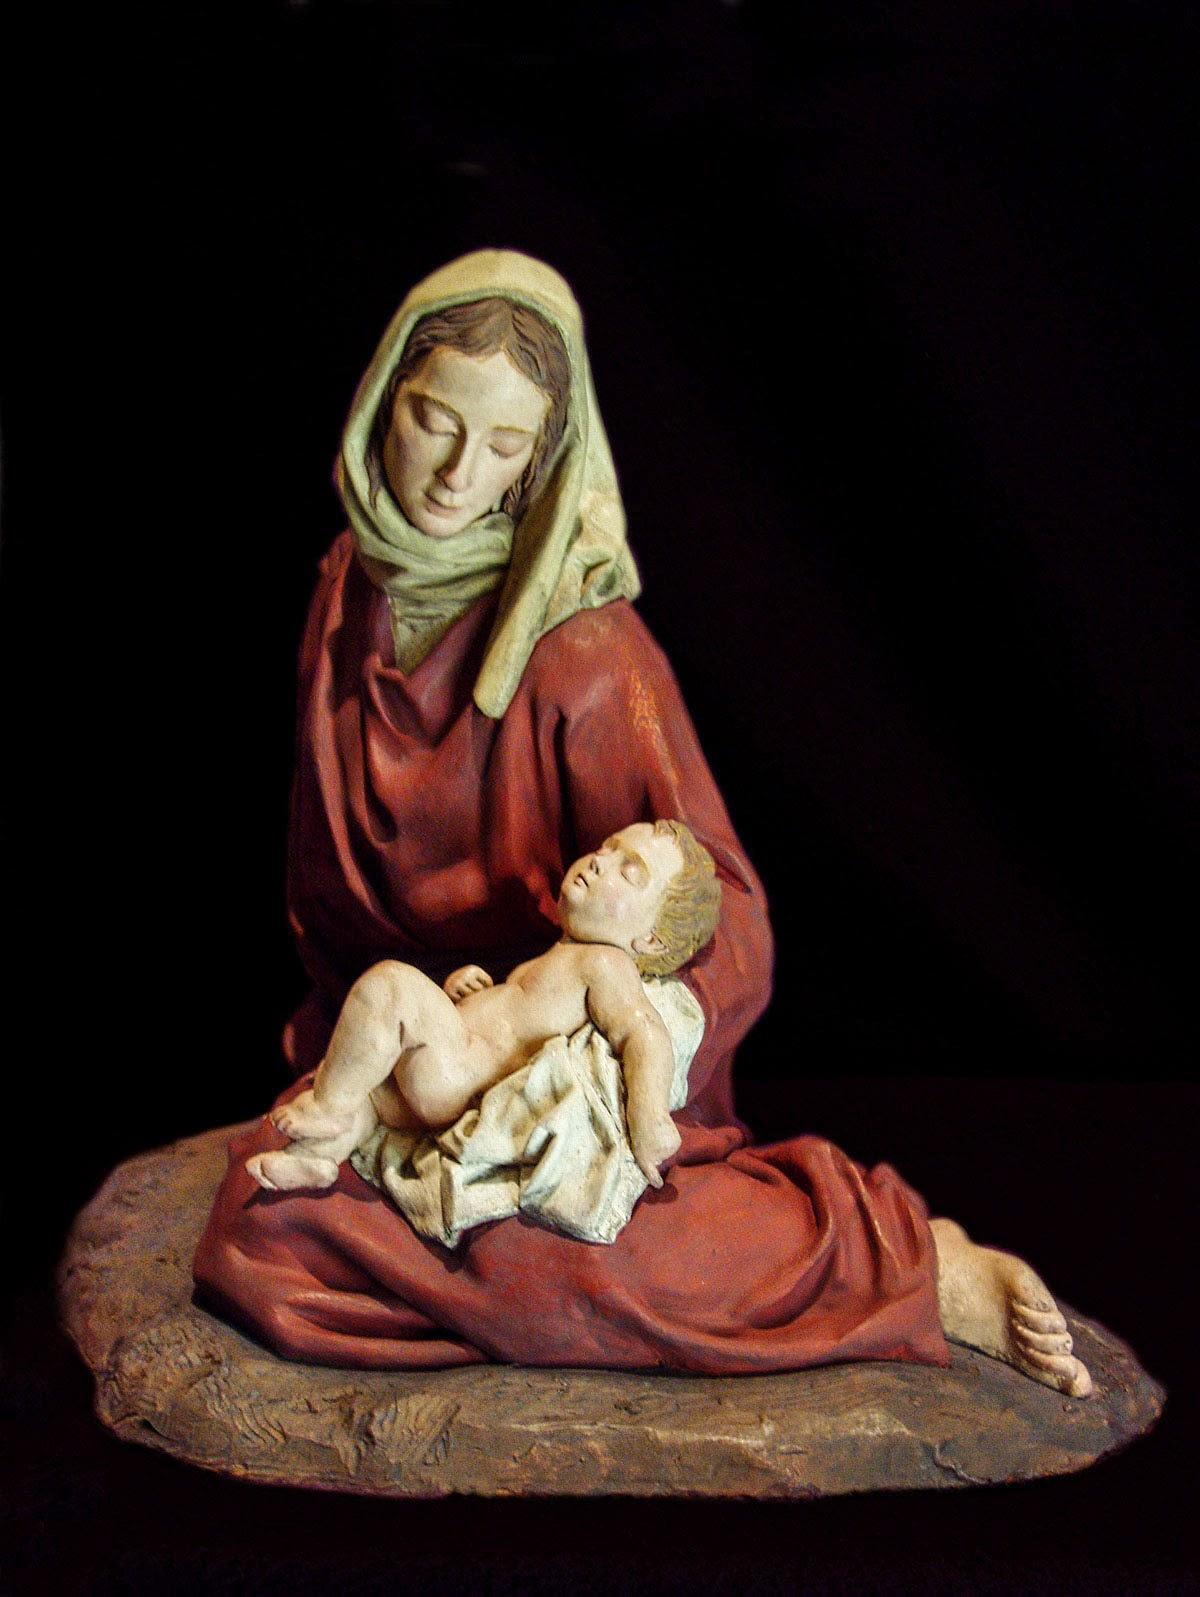 Nacimiento Belén Nativity krippe presepe Arturo Serra Gómez Barro cocido 2